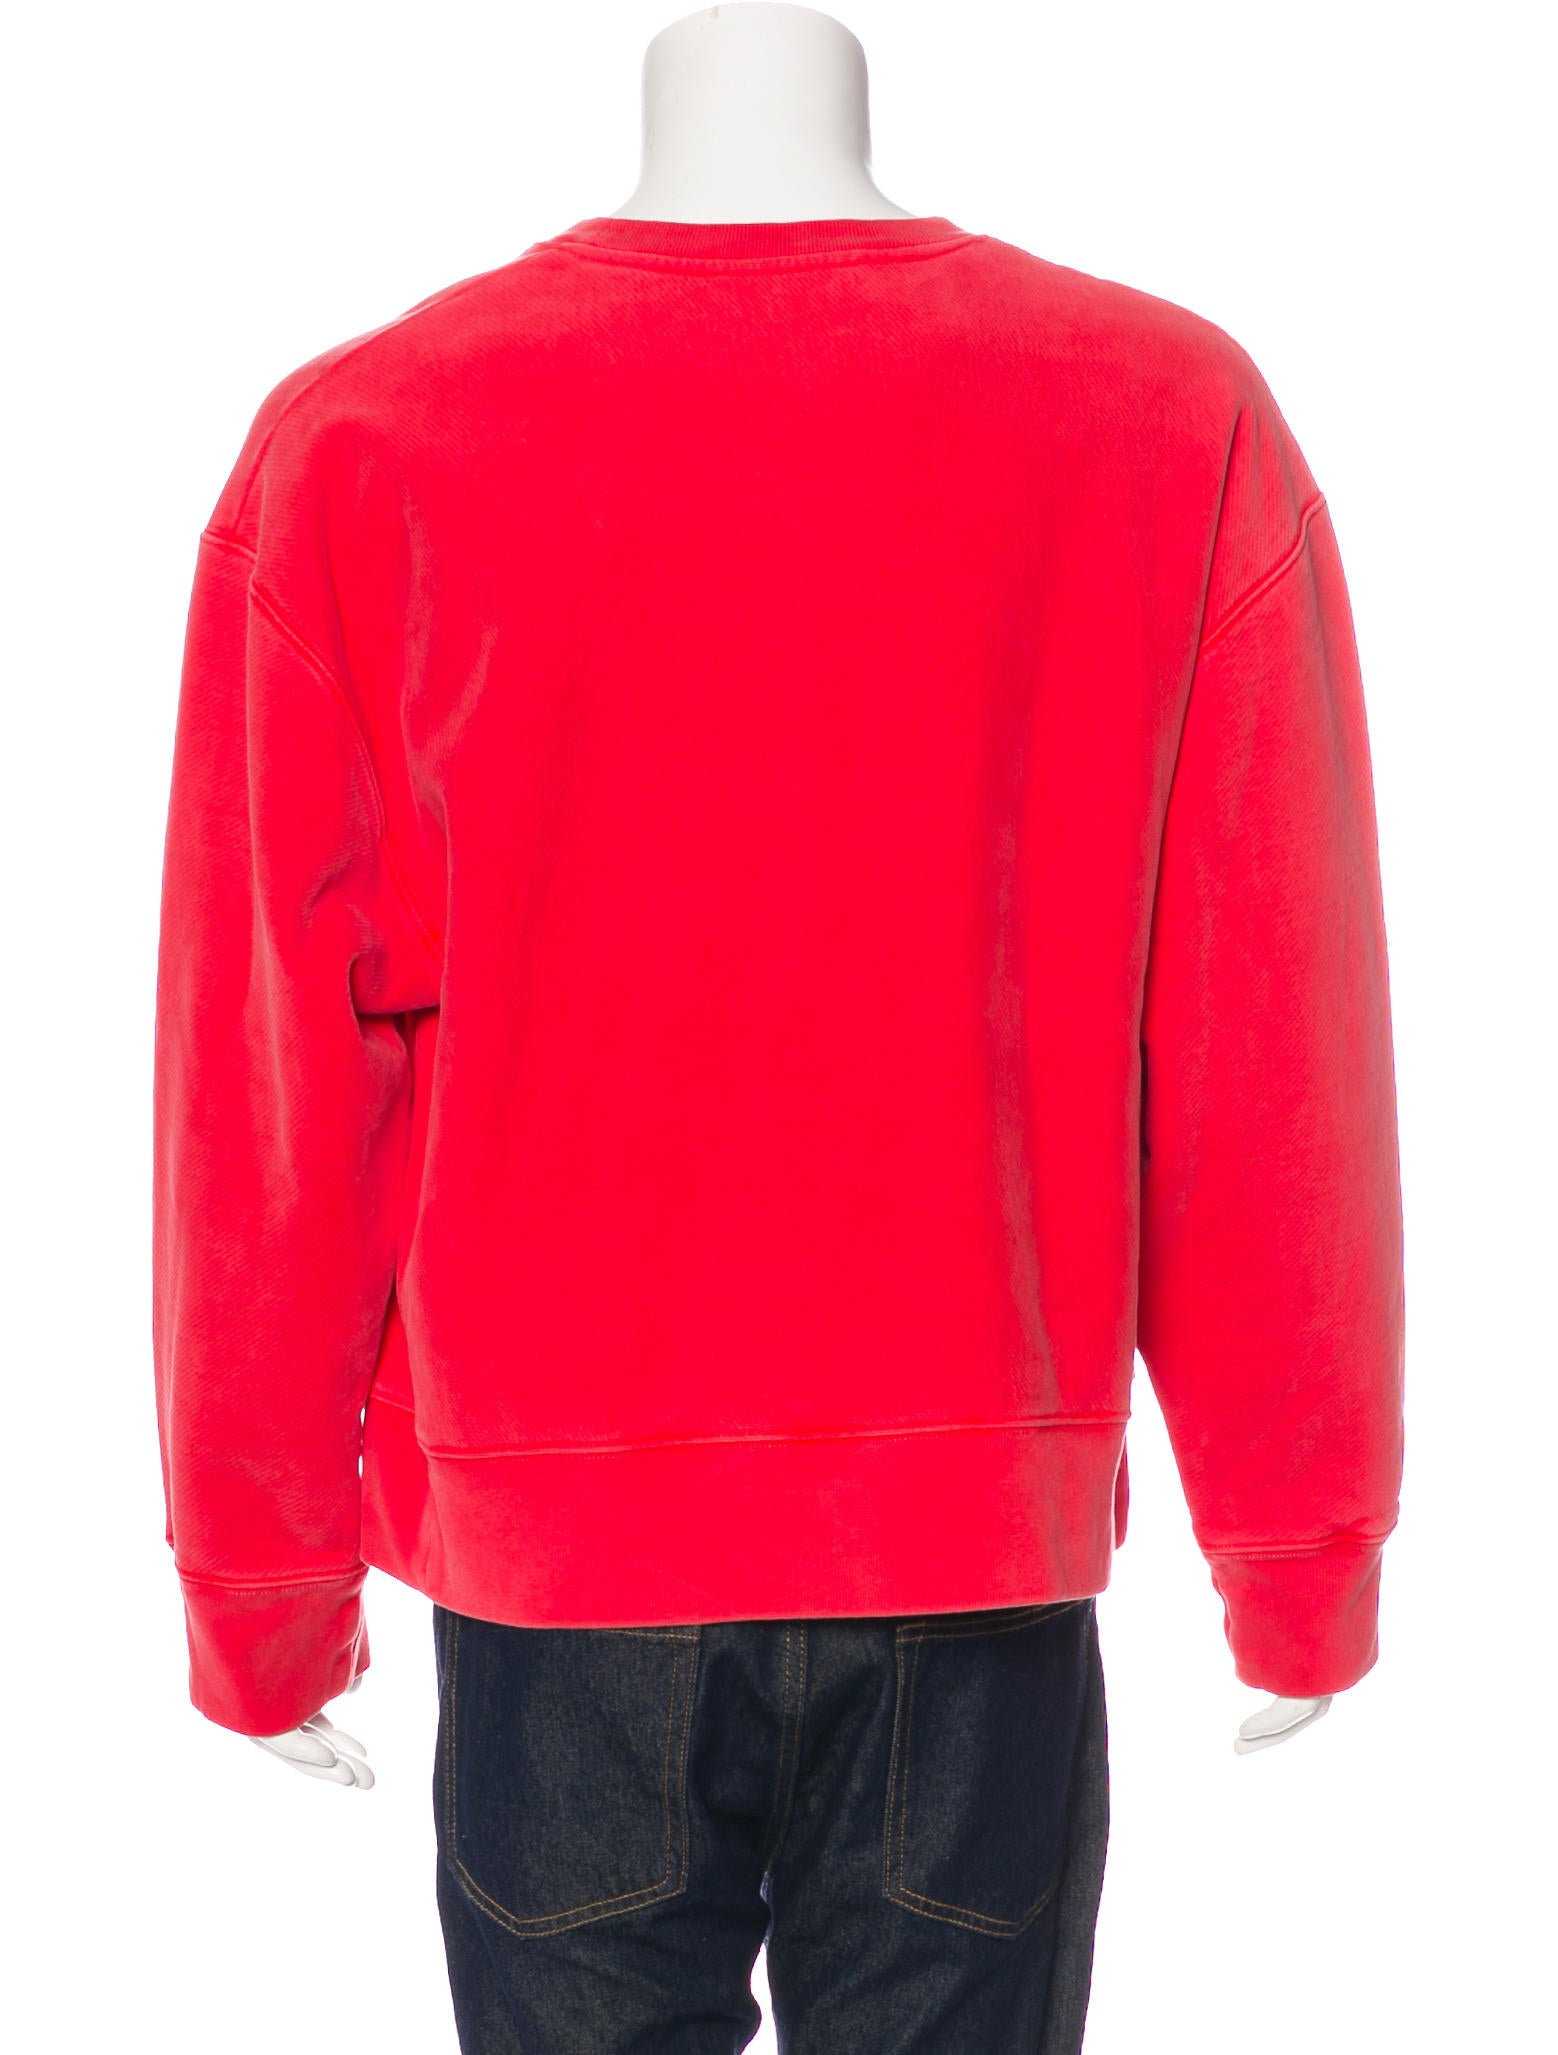 yeezy season 3 sweatshirt clothing wyeez20627 the. Black Bedroom Furniture Sets. Home Design Ideas